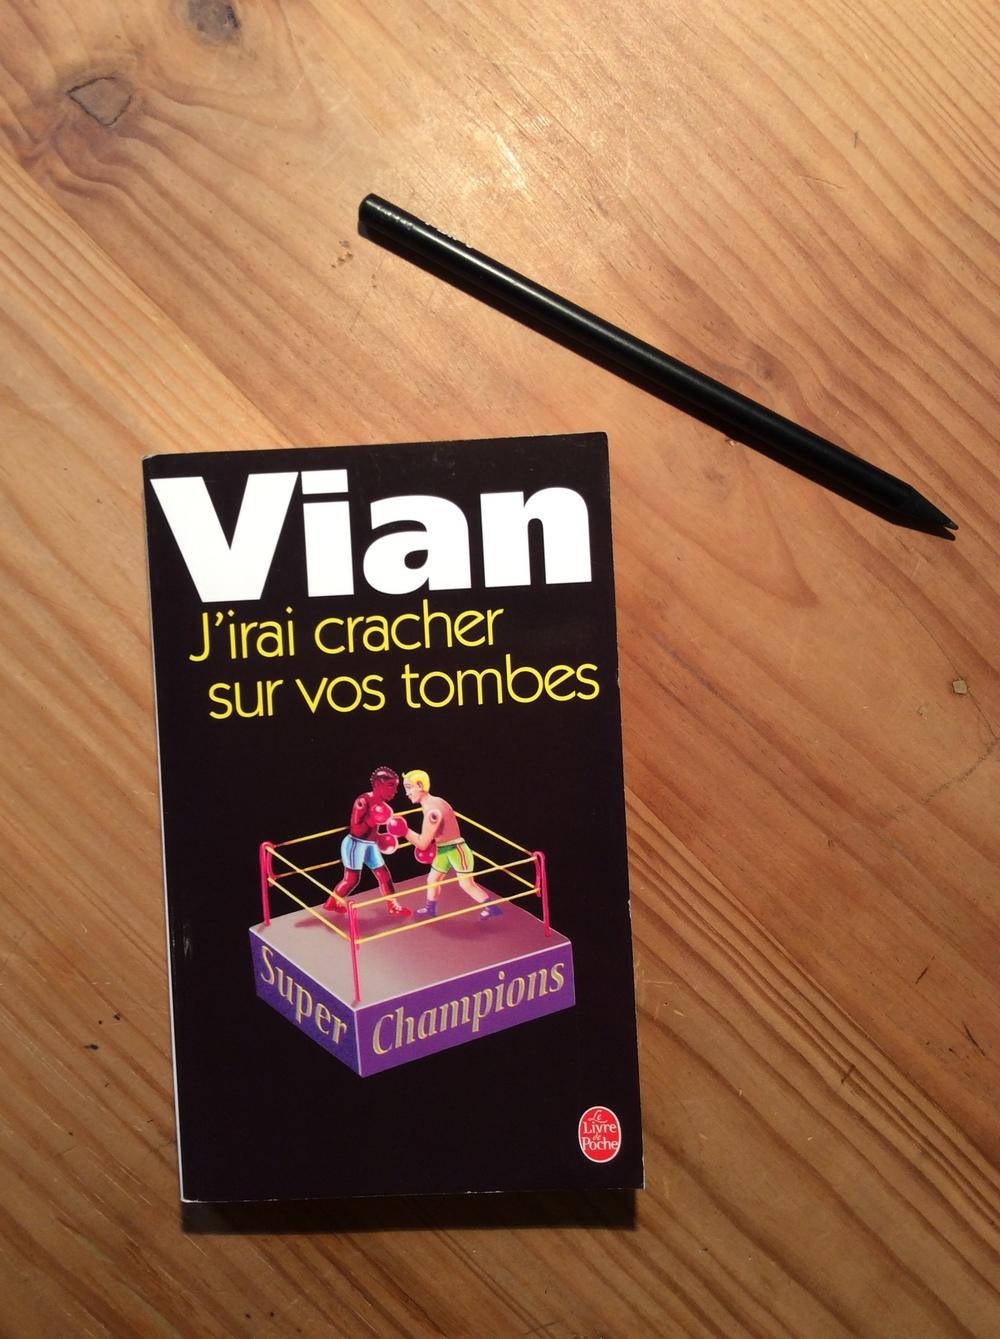 J'irai cracher sur vos tombes,Boris Vian